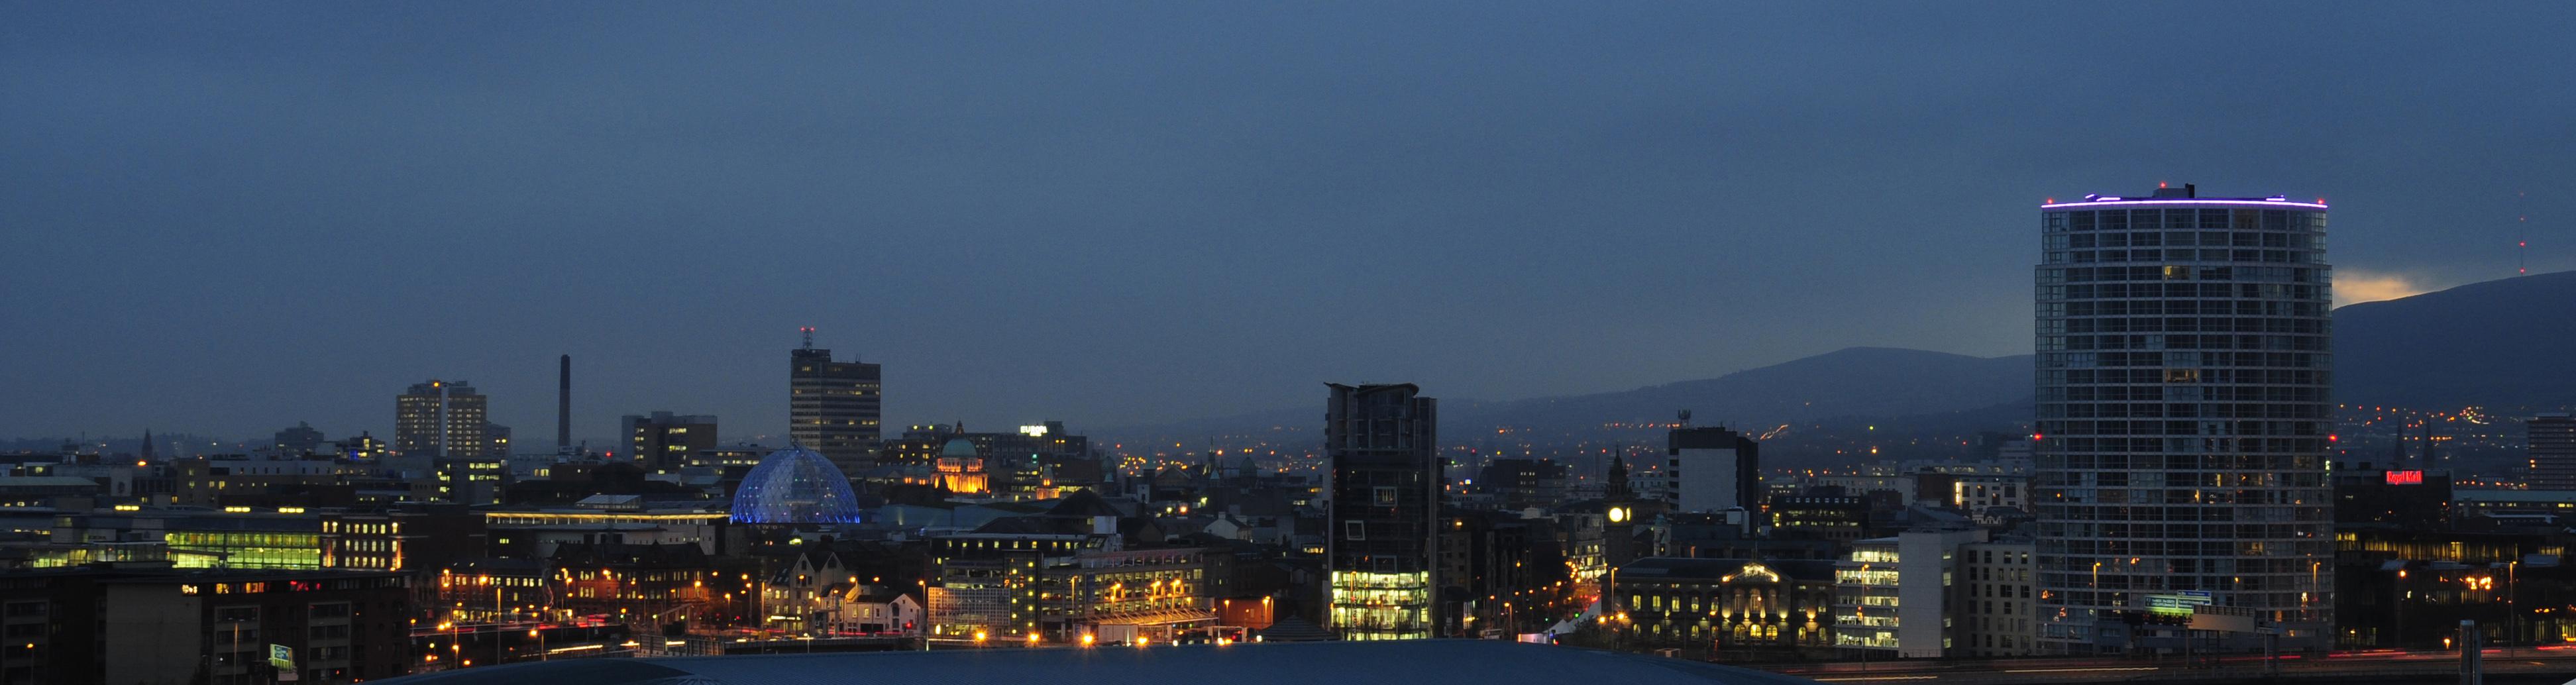 City Lights Panorama